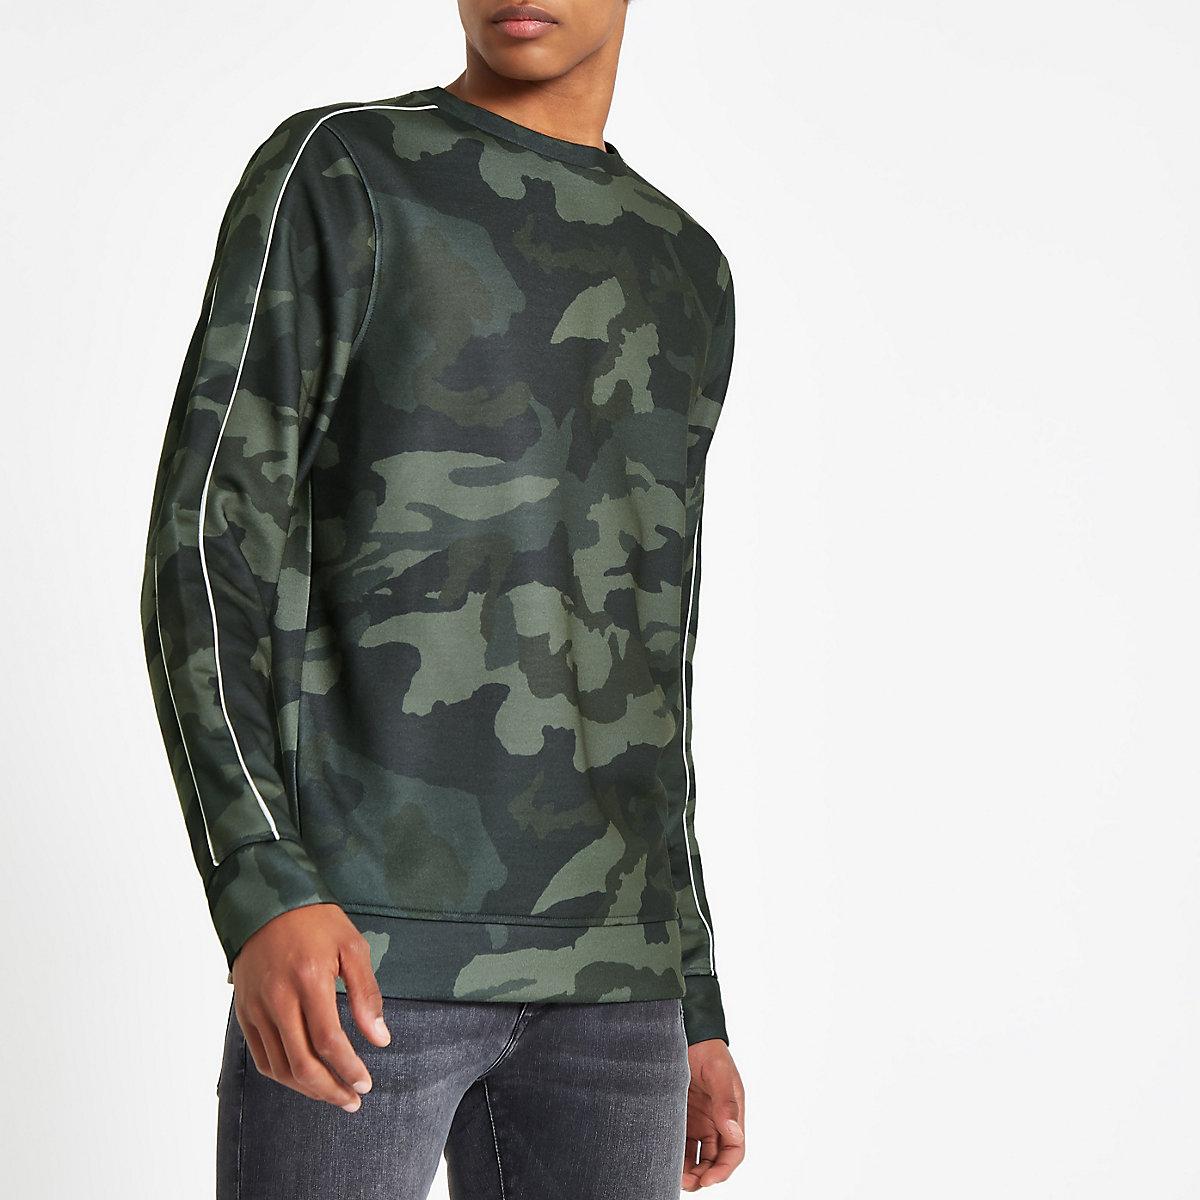 Khaki green camo print slim fit sweatshirt